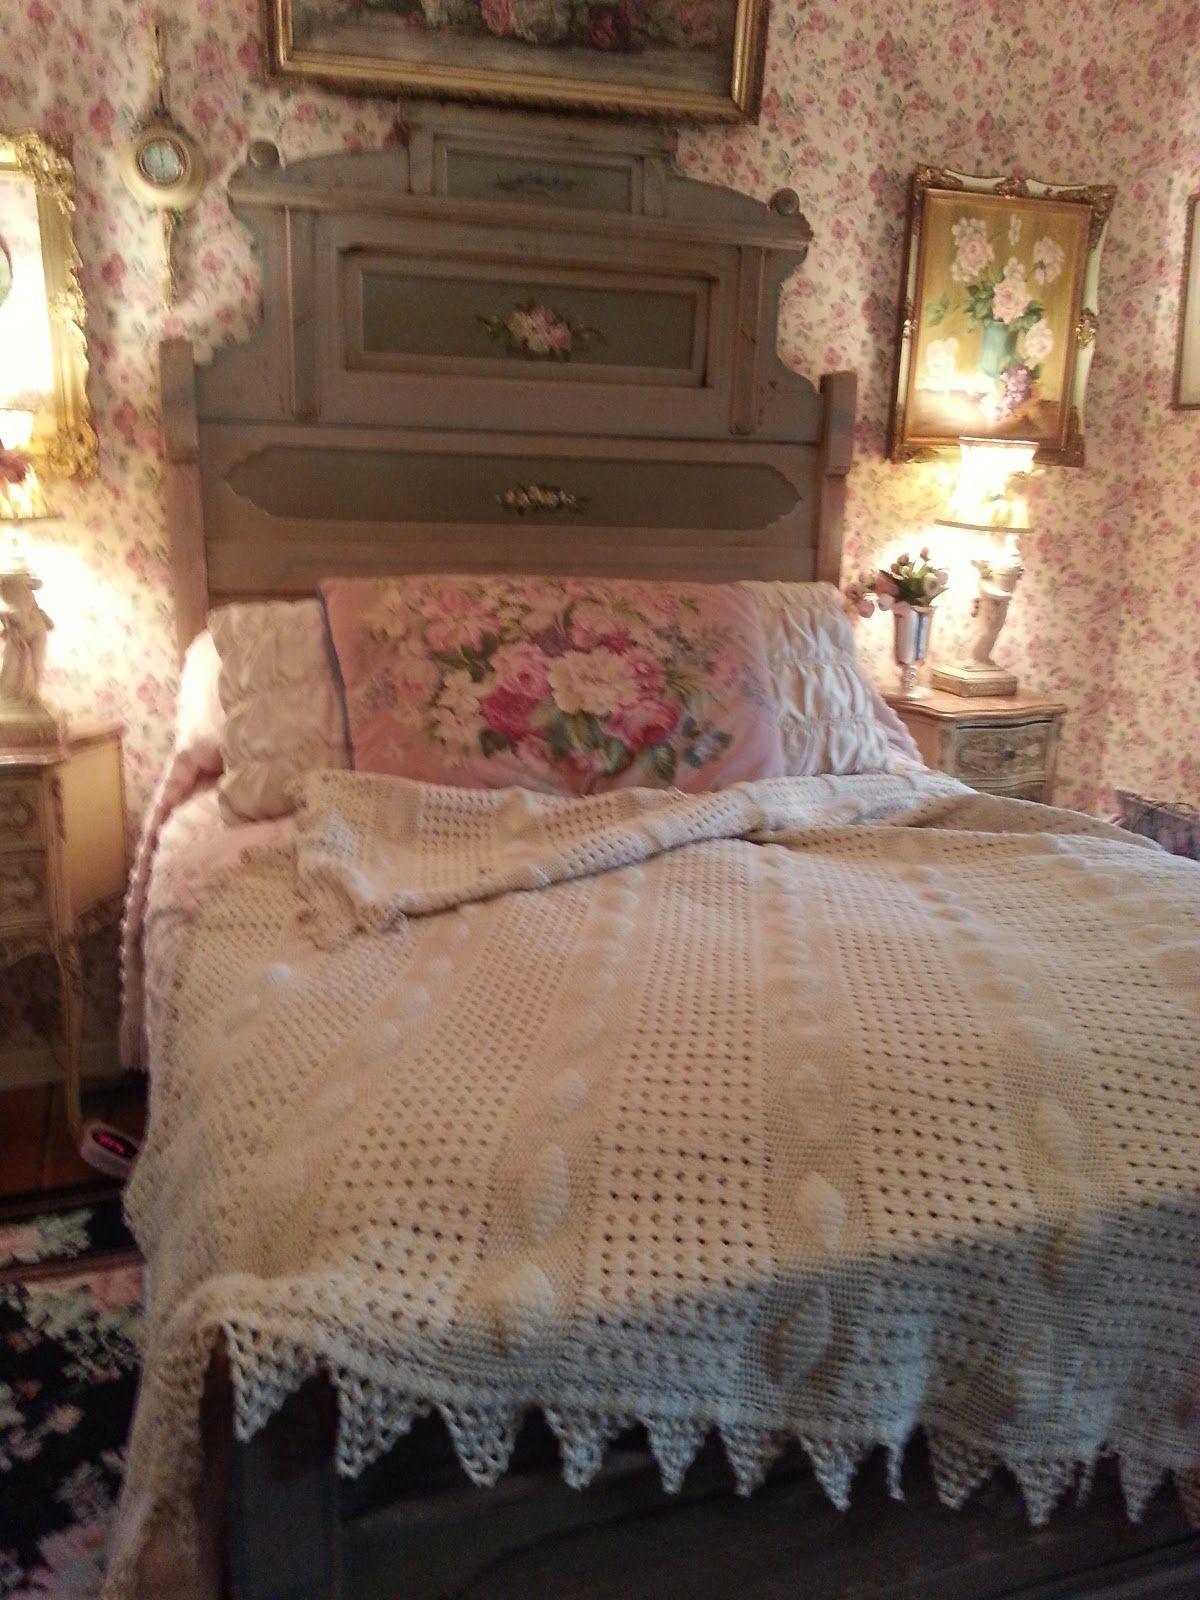 CORRABELLE ROSE: Antique Bedding | Accessorizing your ...